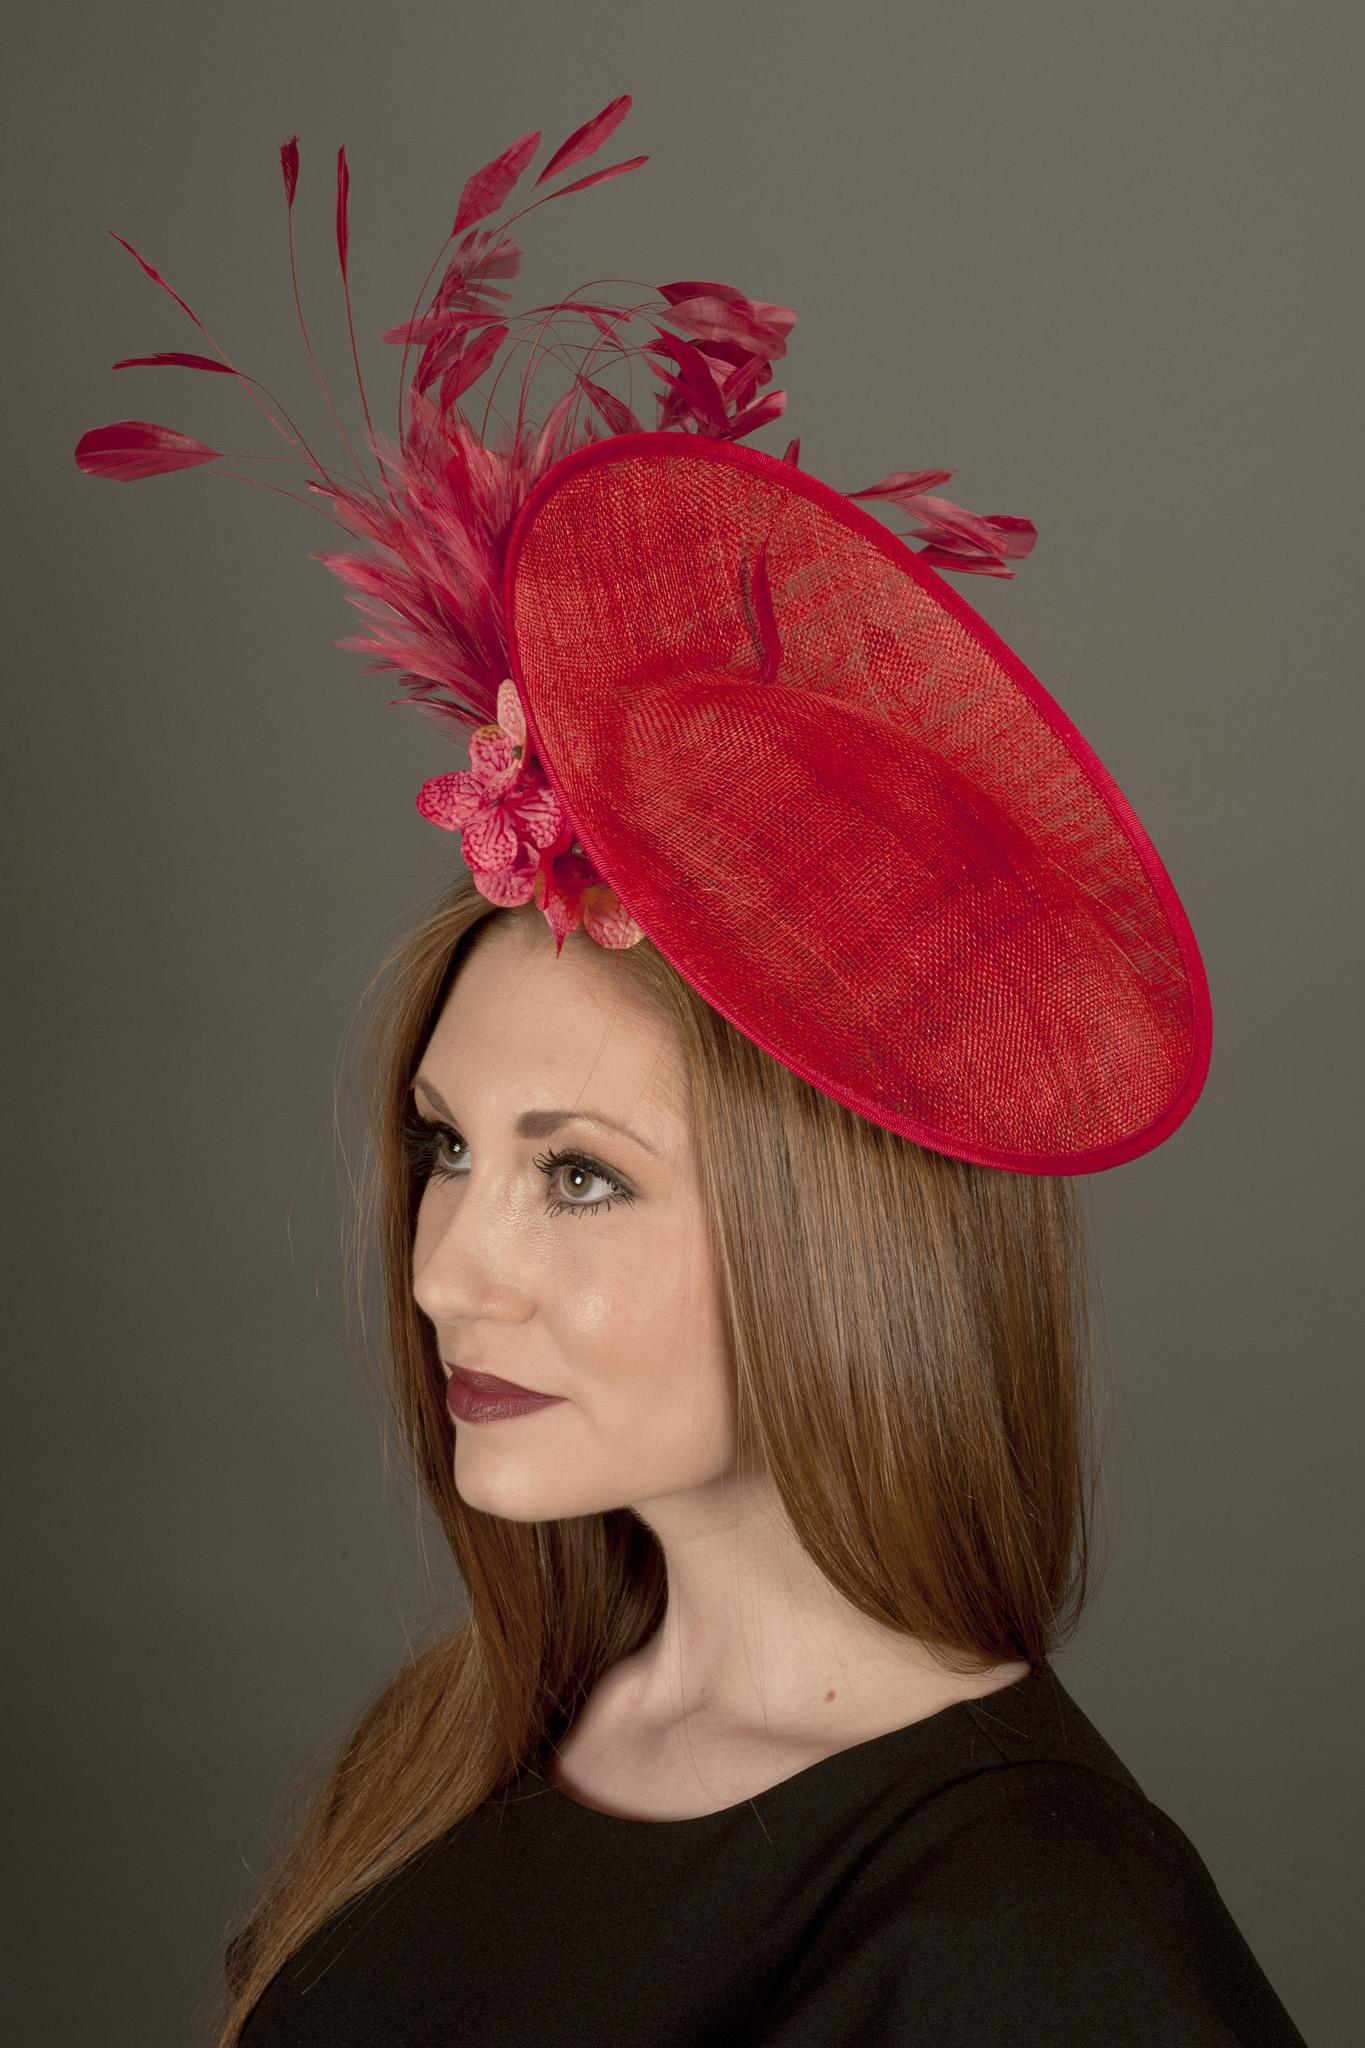 Upscale Kentucky Derby Ladies Hats Fascinators By America S Best Milliner Polly Singer